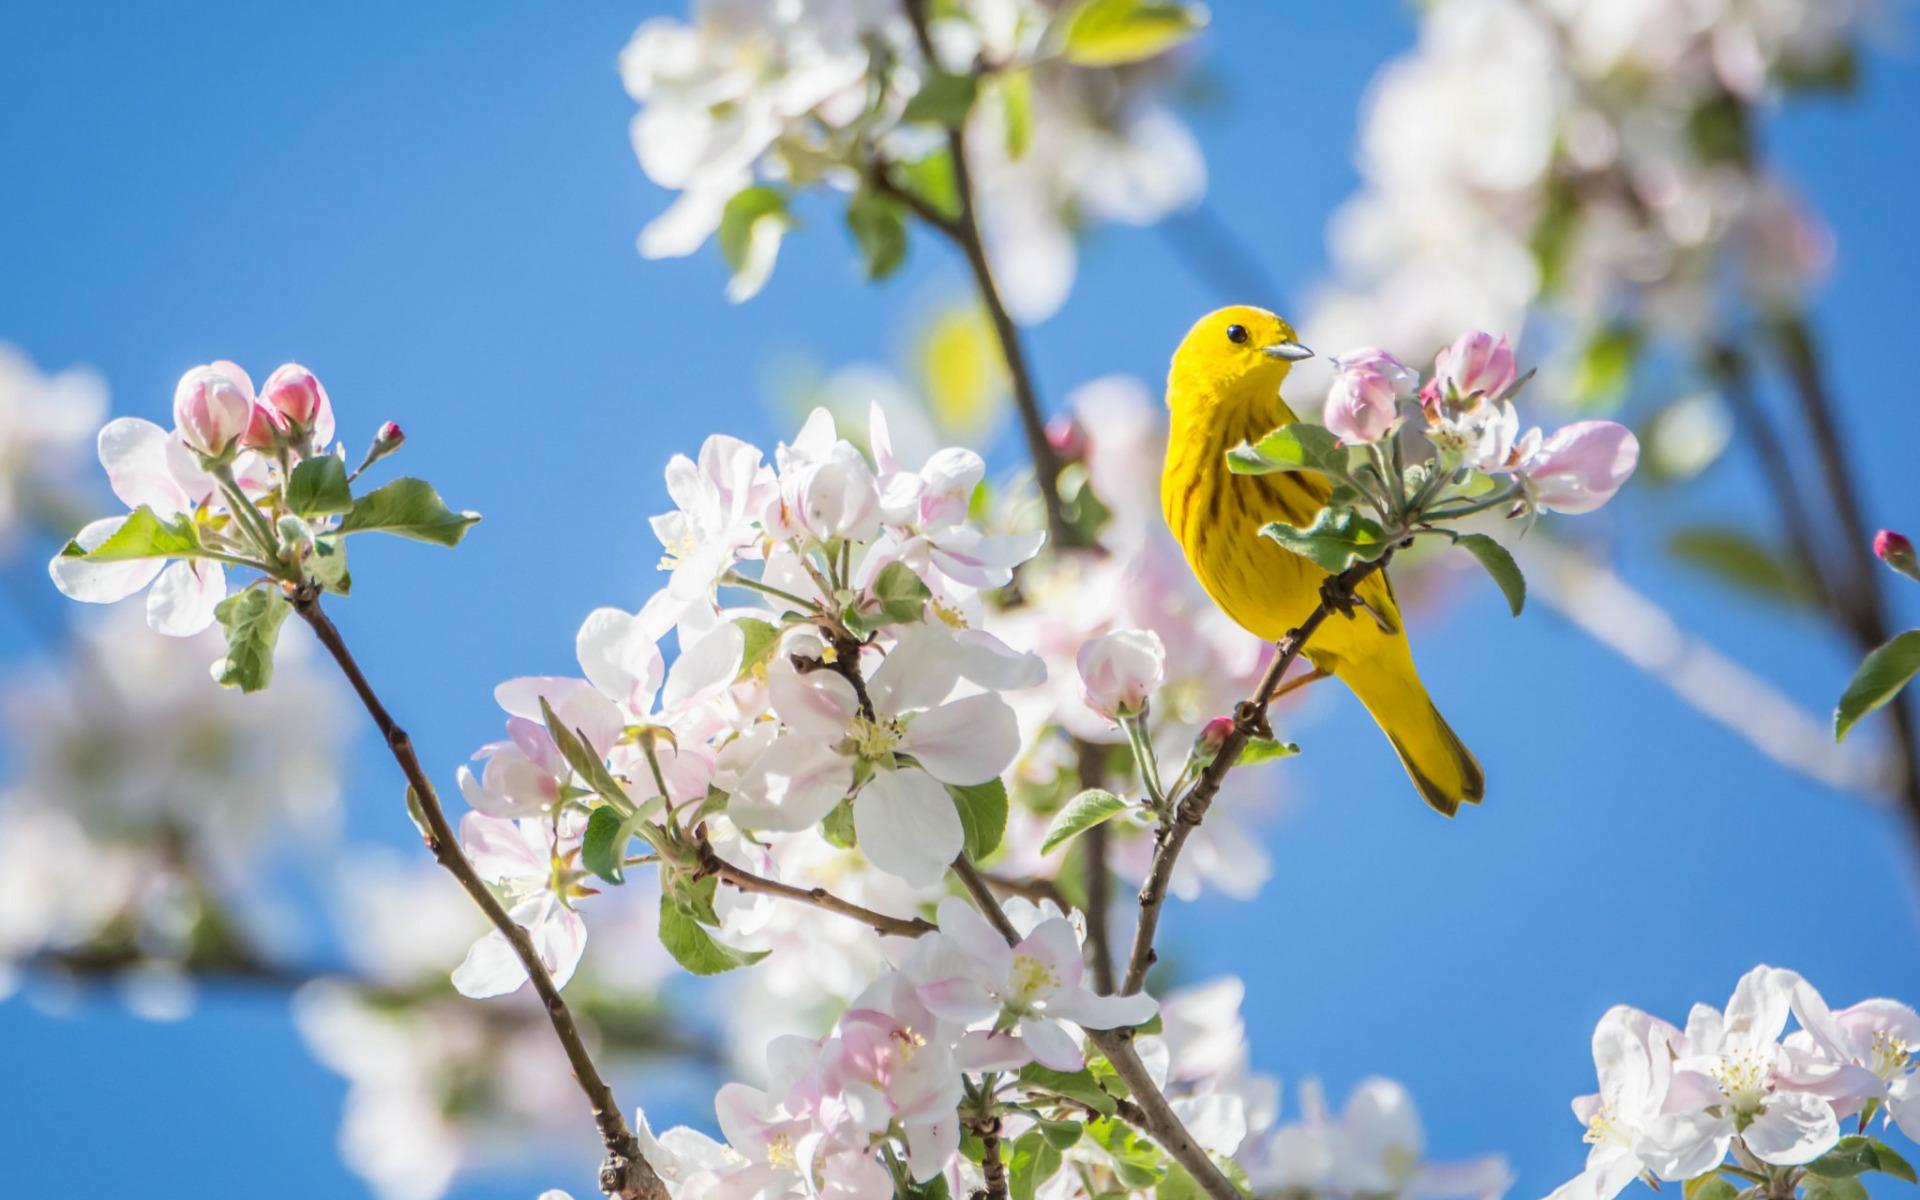 птичка весной картинка